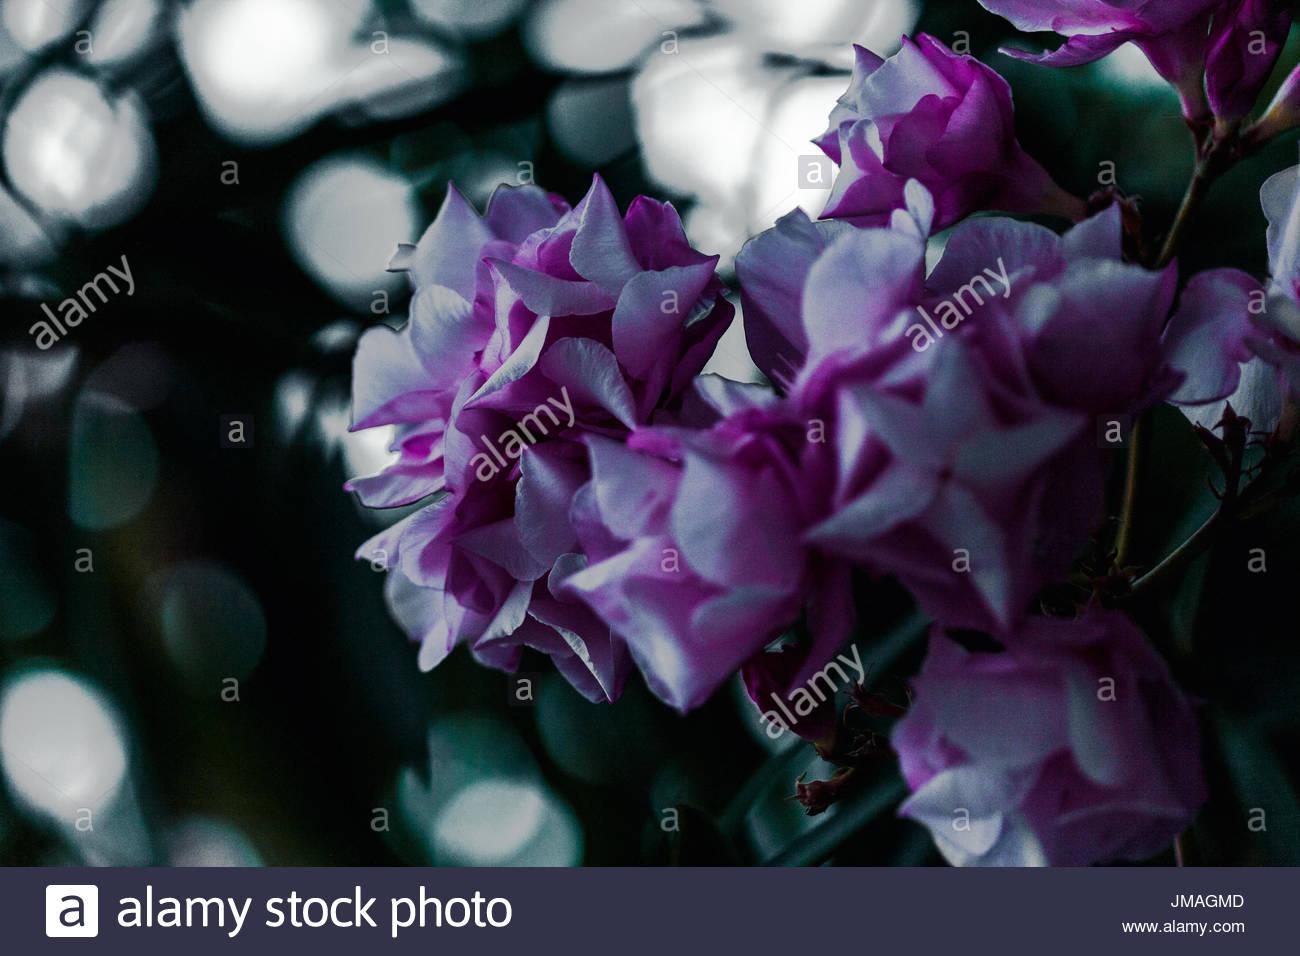 Flower in Albenga, Liguria, Italy. - Stock Image